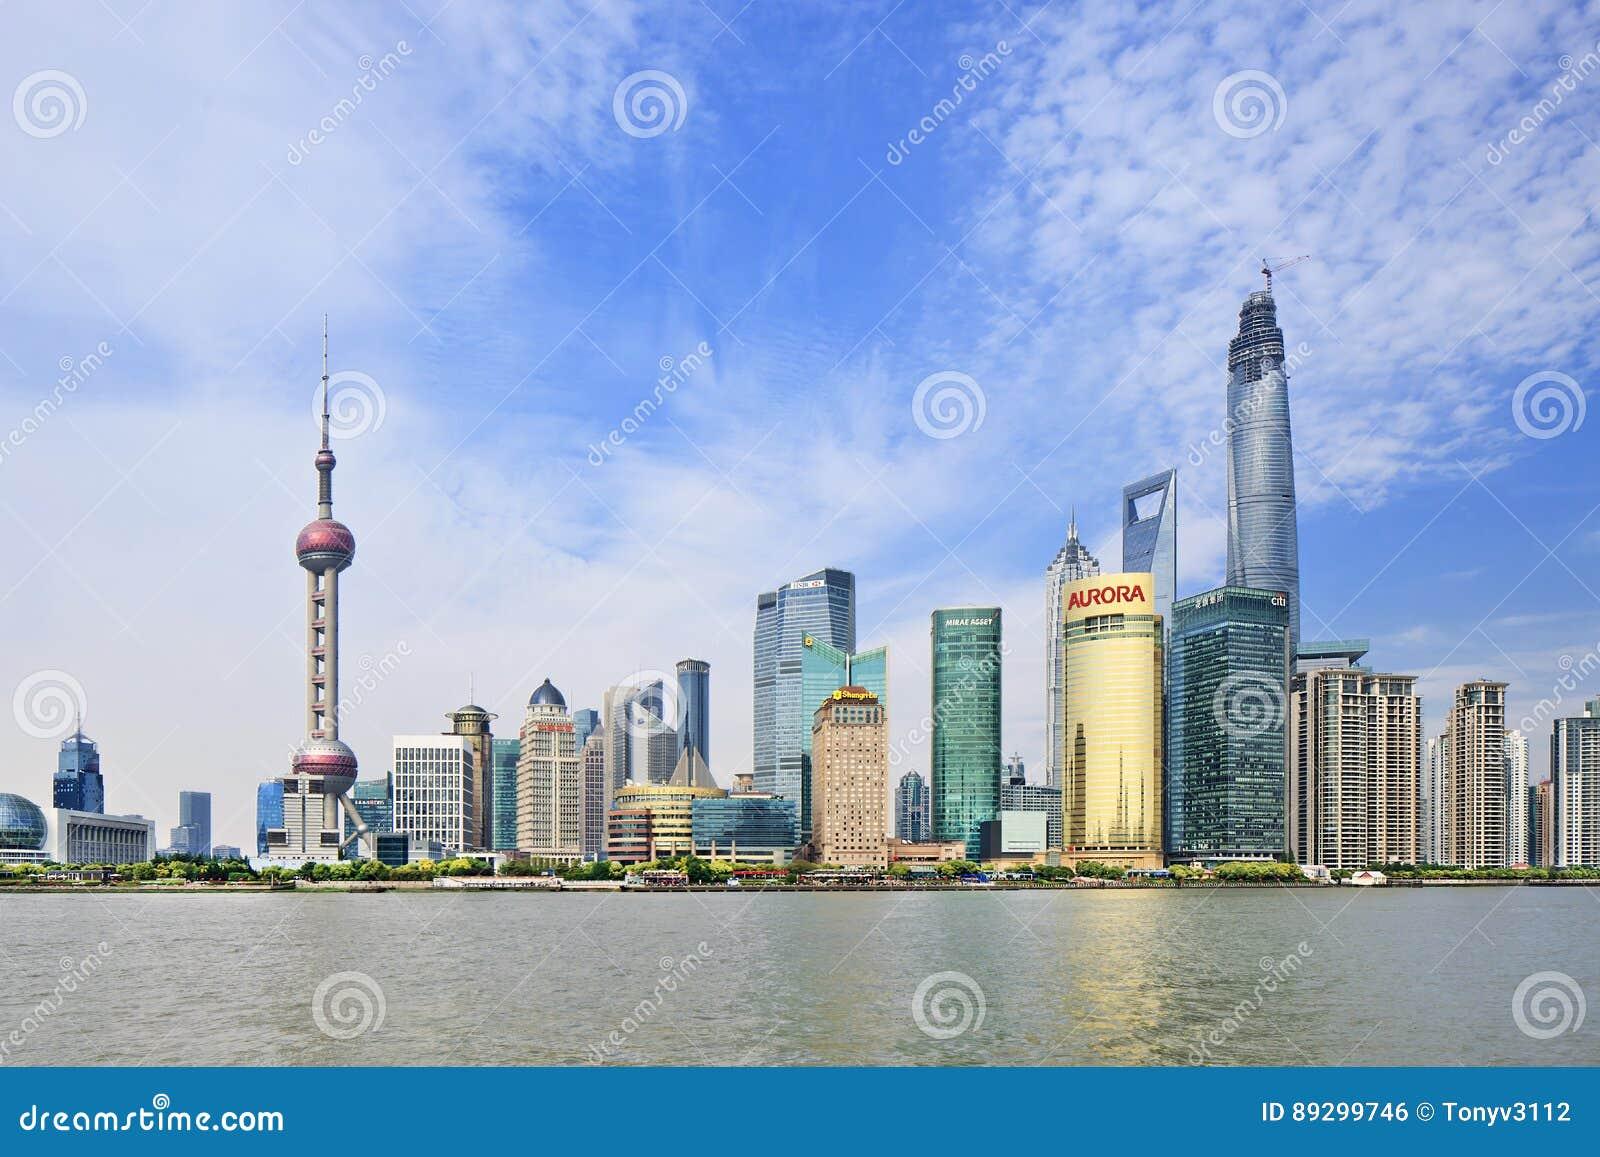 Distrito de Pudong visto del río Huangpu, Shangai, China